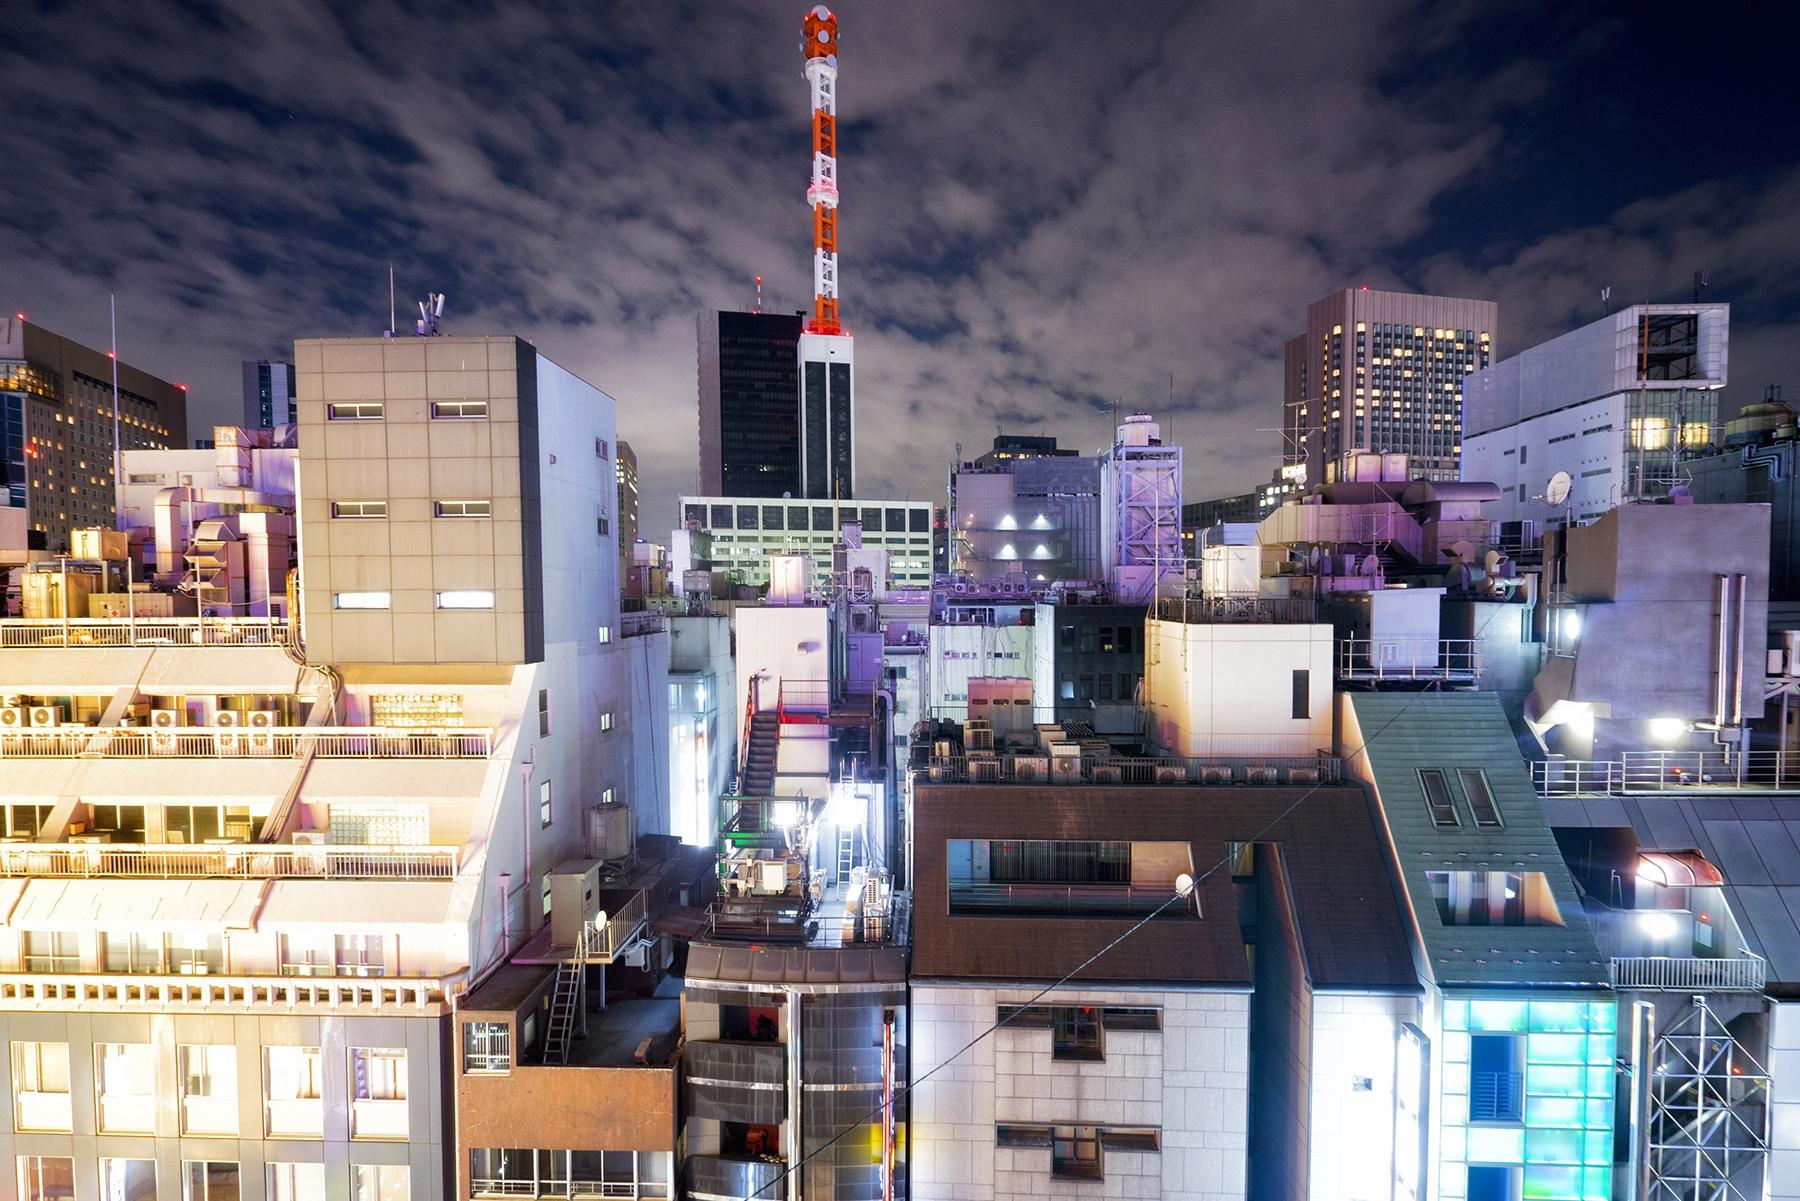 tokyo, japan, three dakihabaraays, travel, visit, tourist, tour, must see, food, night, shibuya, shinjuku, gyoen, national garden, ramen, night tours, lights, shopping, harajuku, skytree, akihabara, rooftop